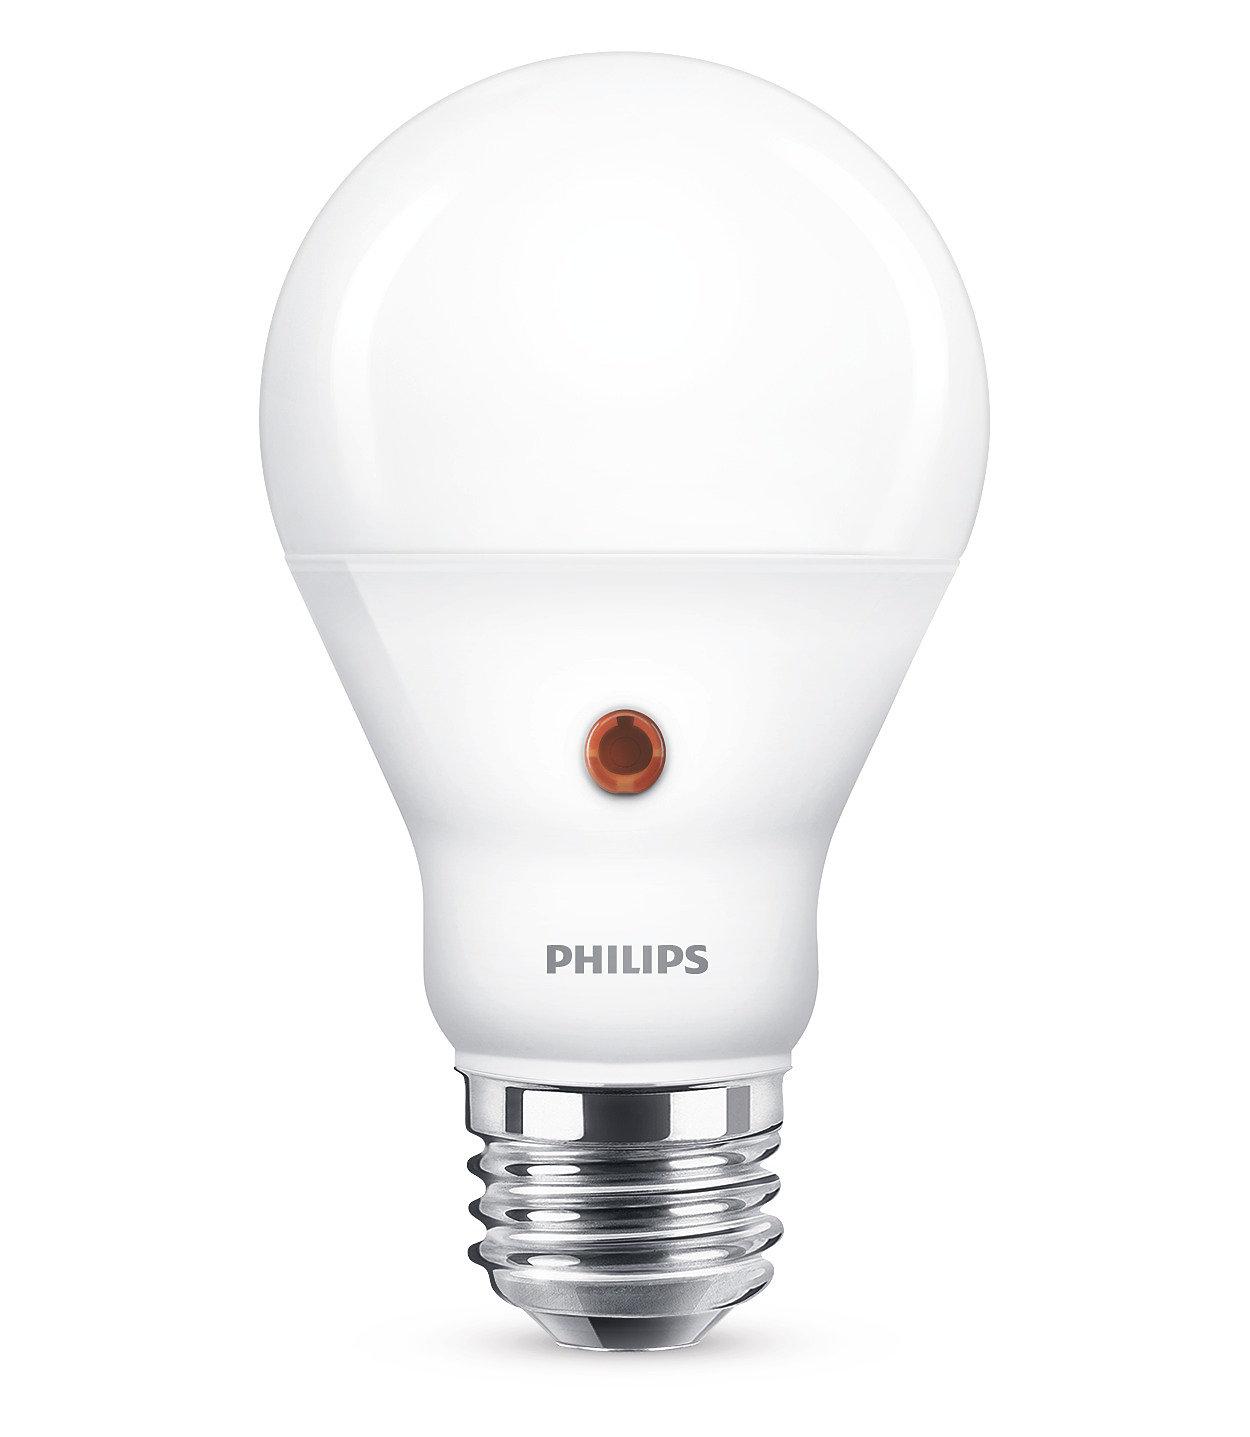 Lampadina a LED, sensore luminoso giorno e notte